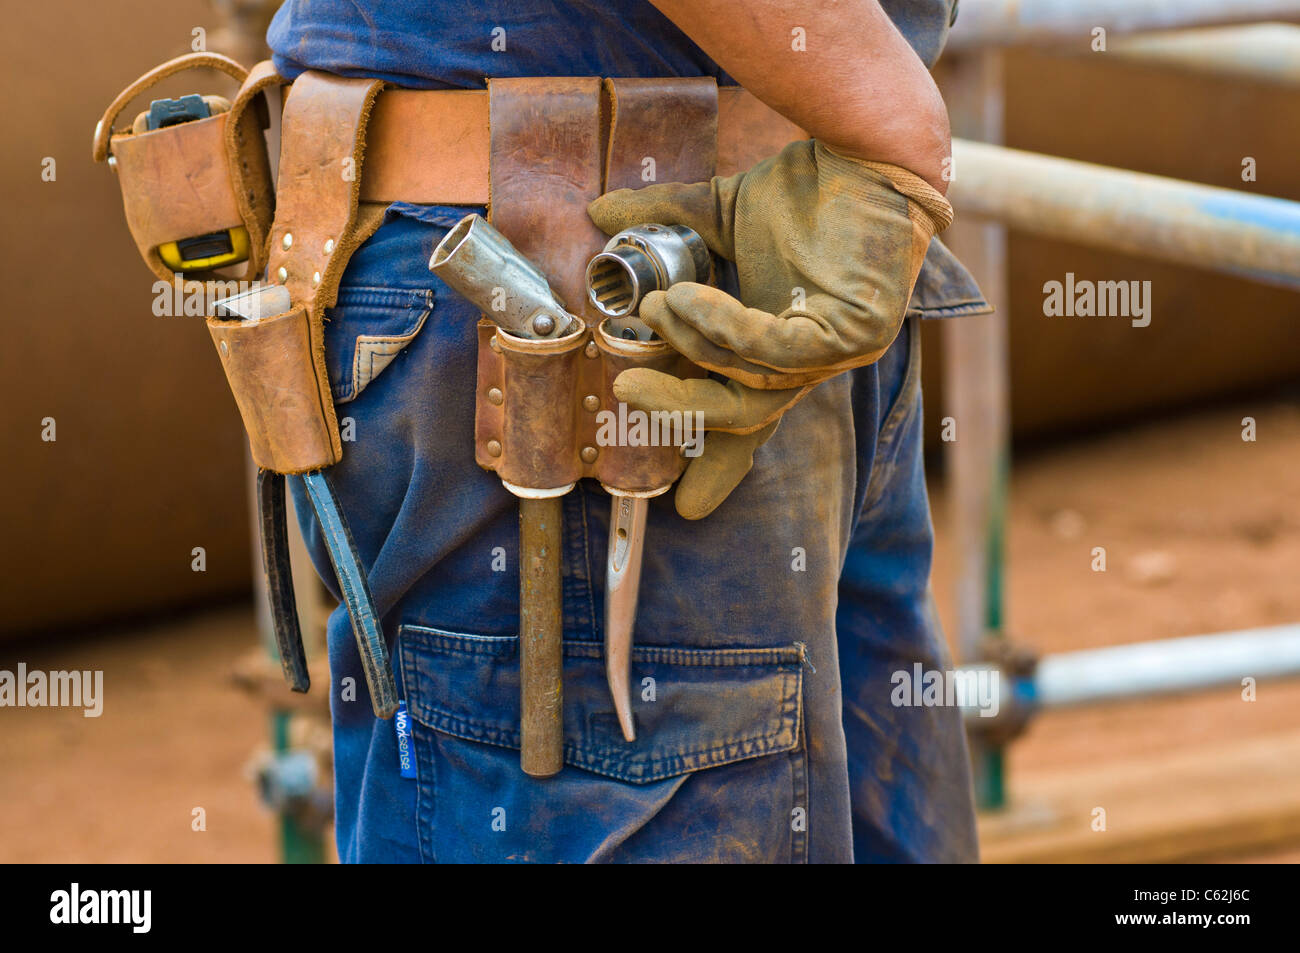 A scaffolder's tool belt - Stock Image